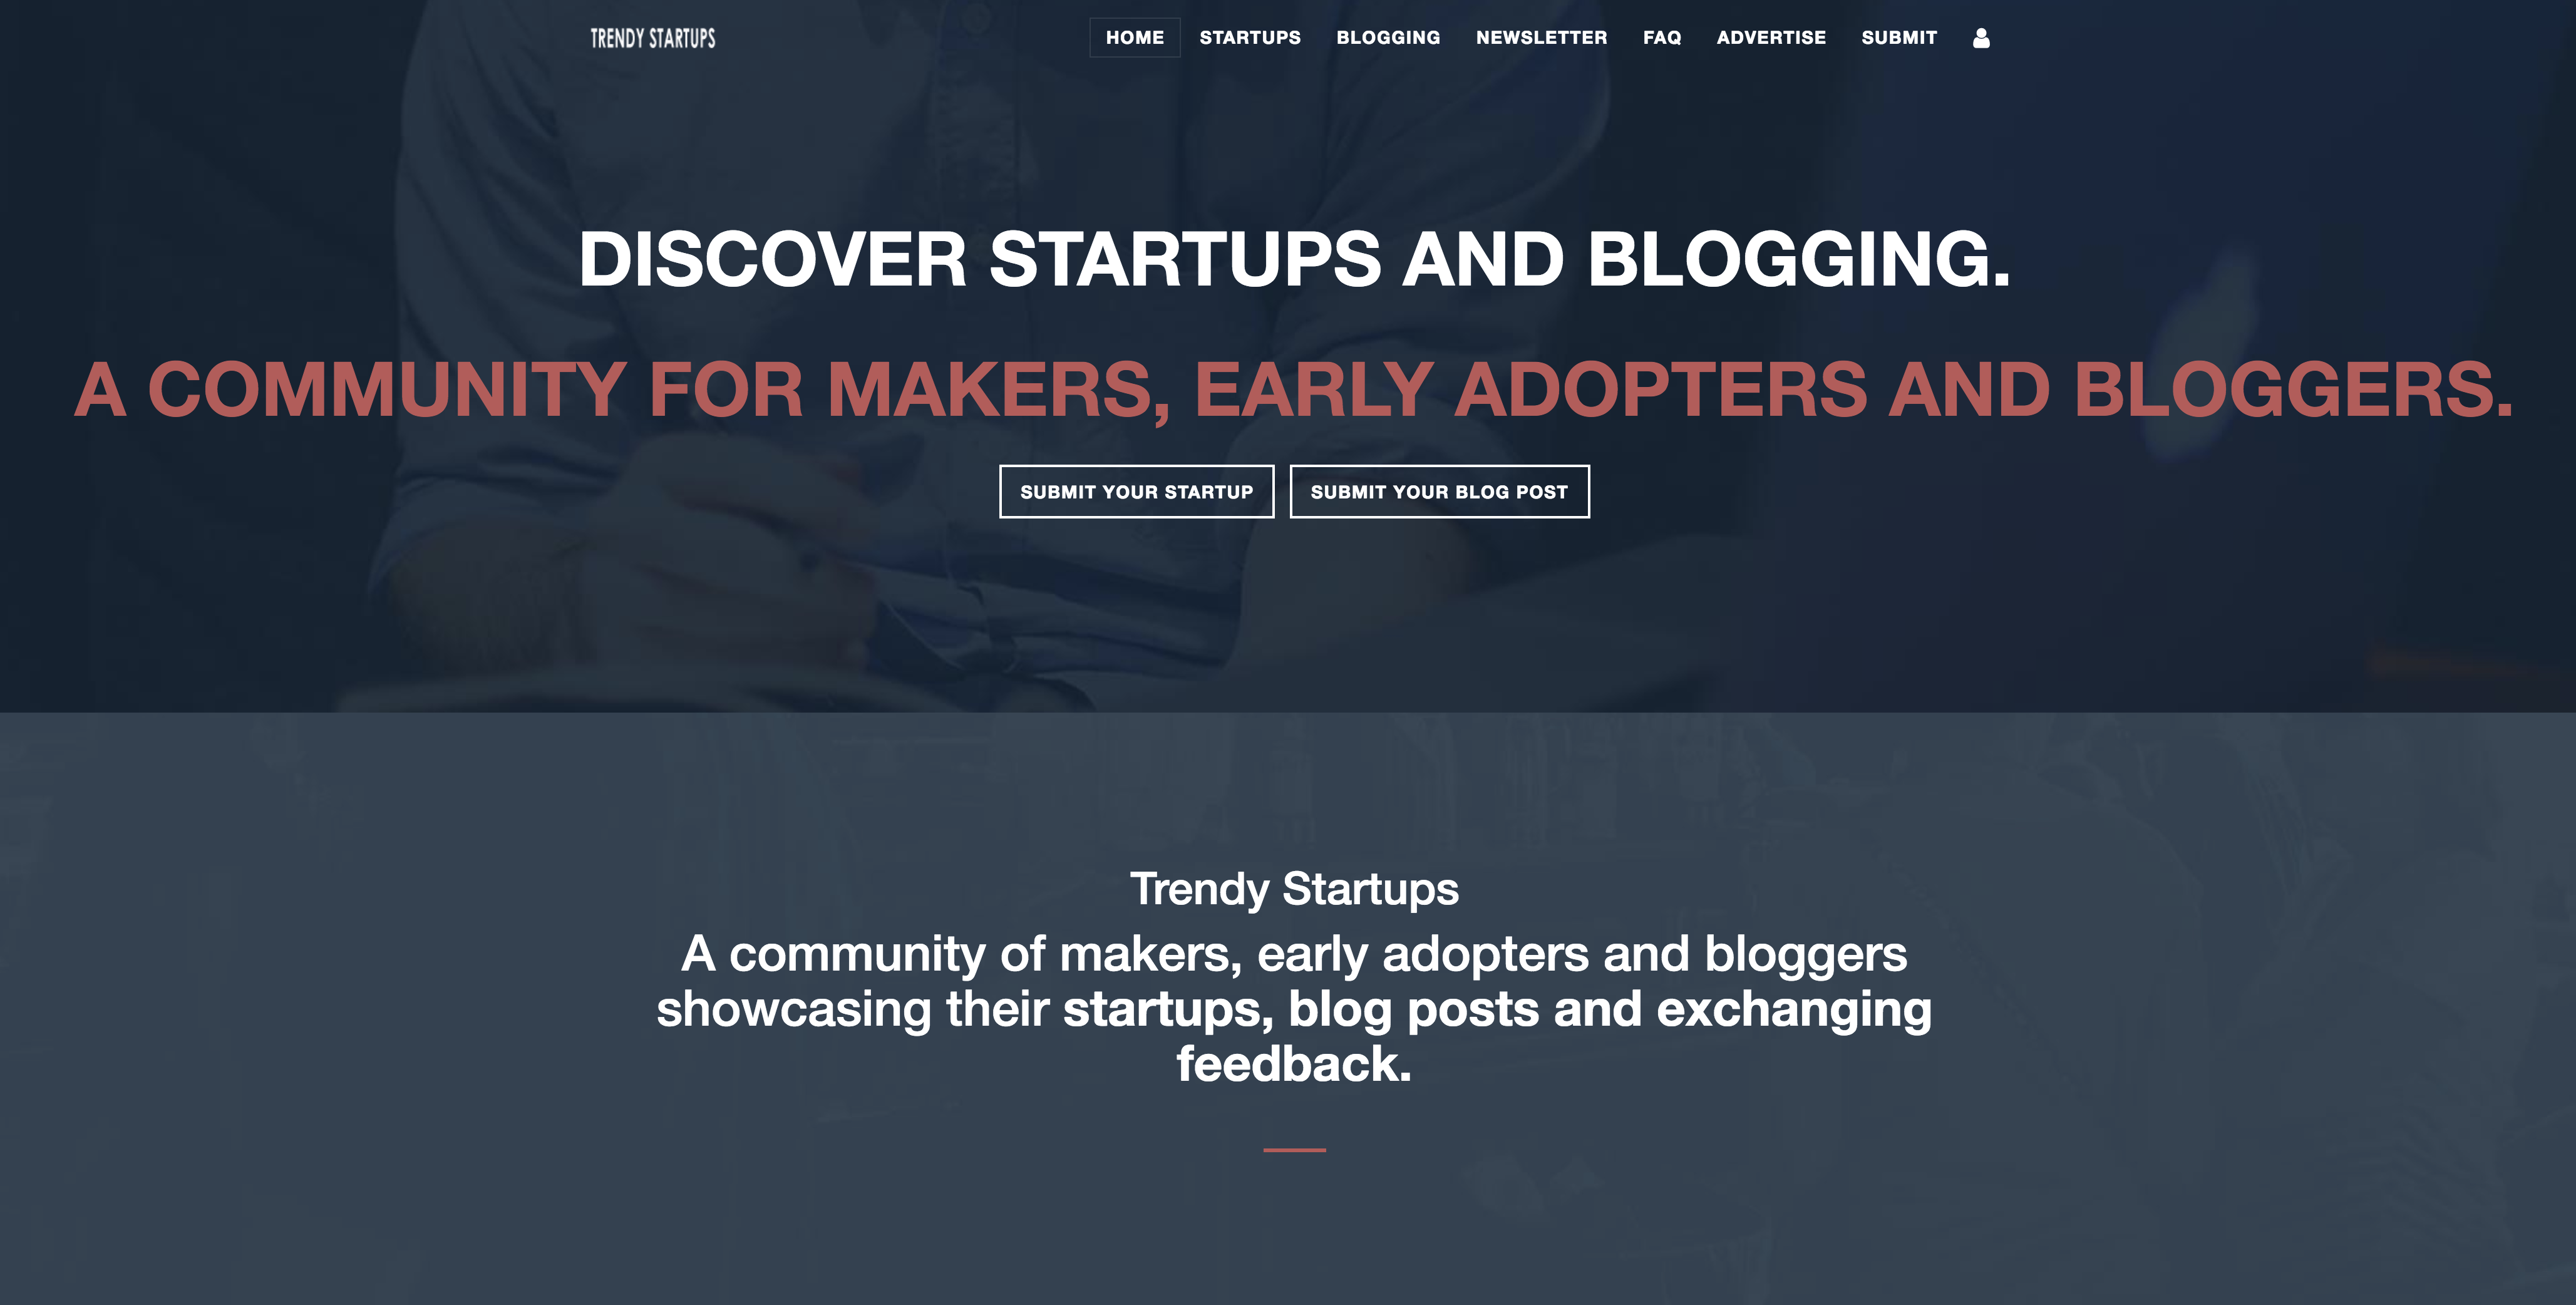 Trendy startups